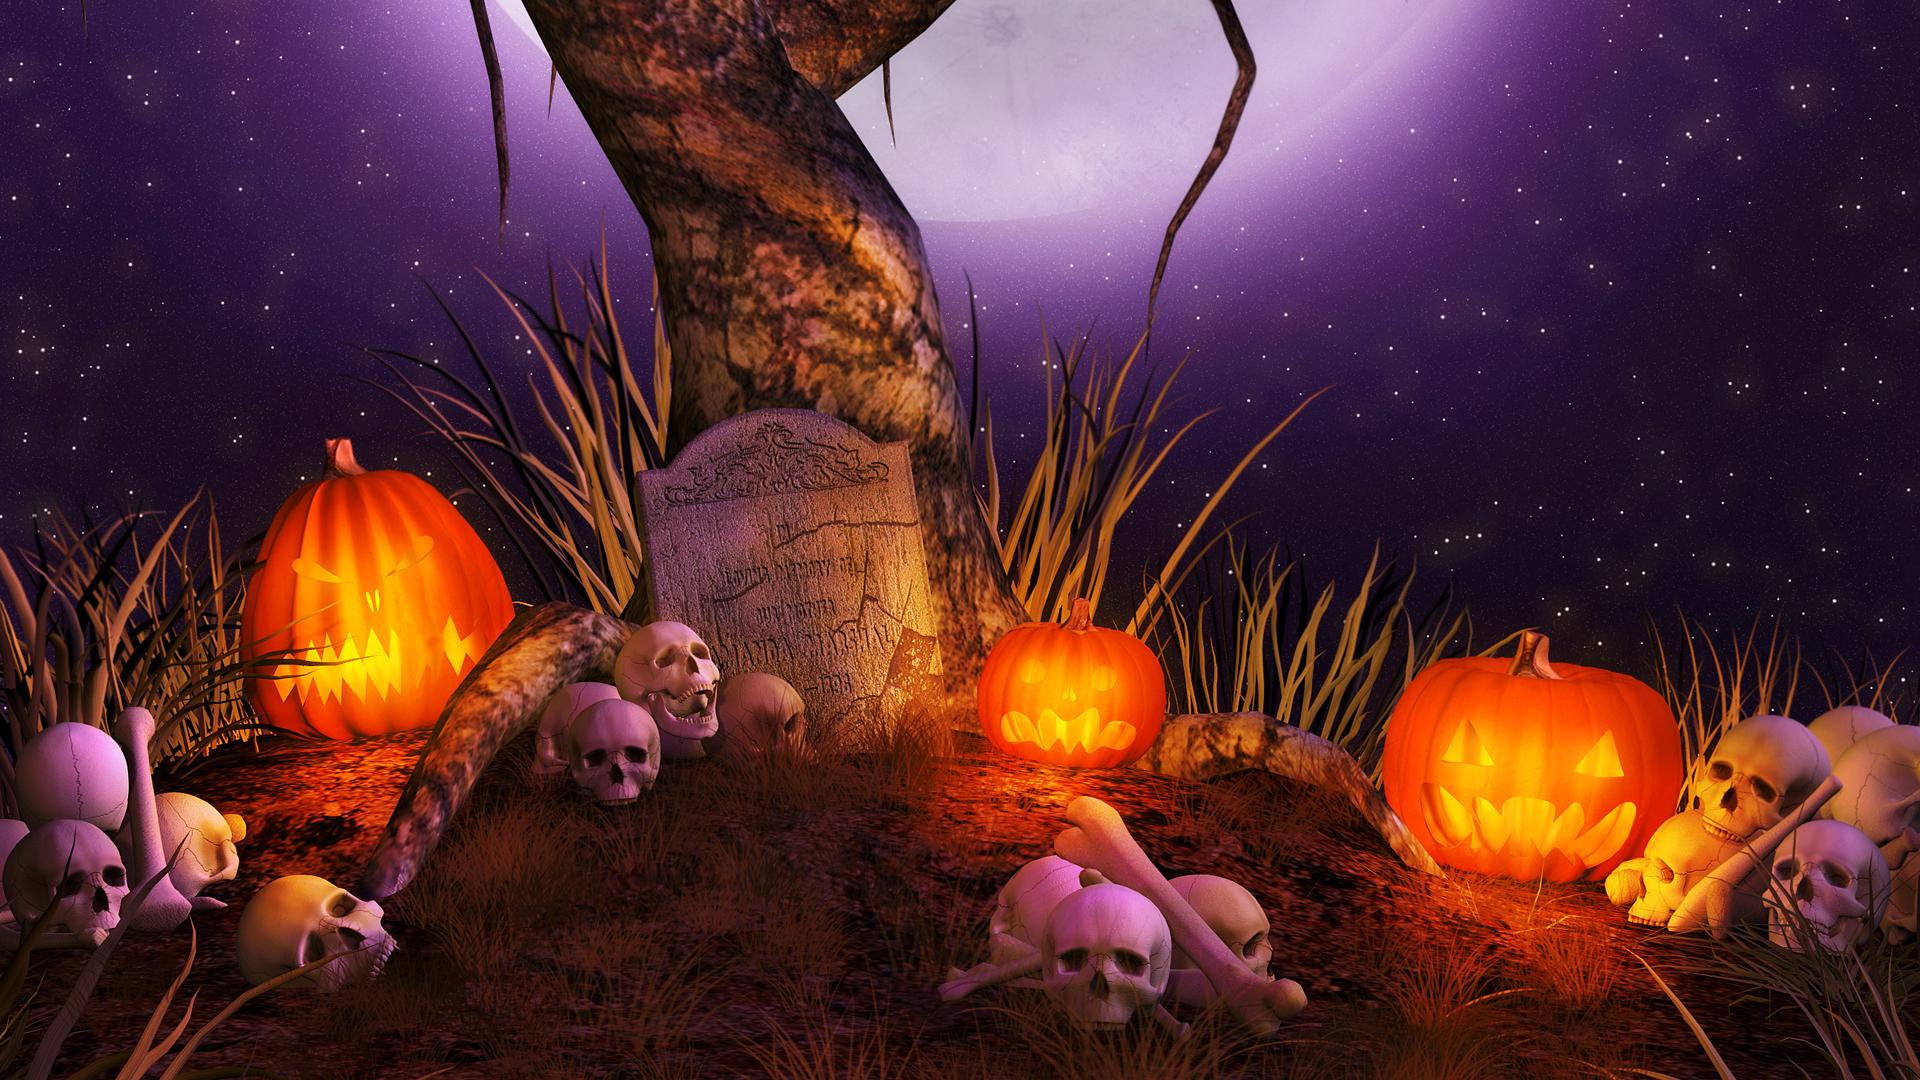 1920x1080 HD Halloween Wallpaper - WallpaperSafari